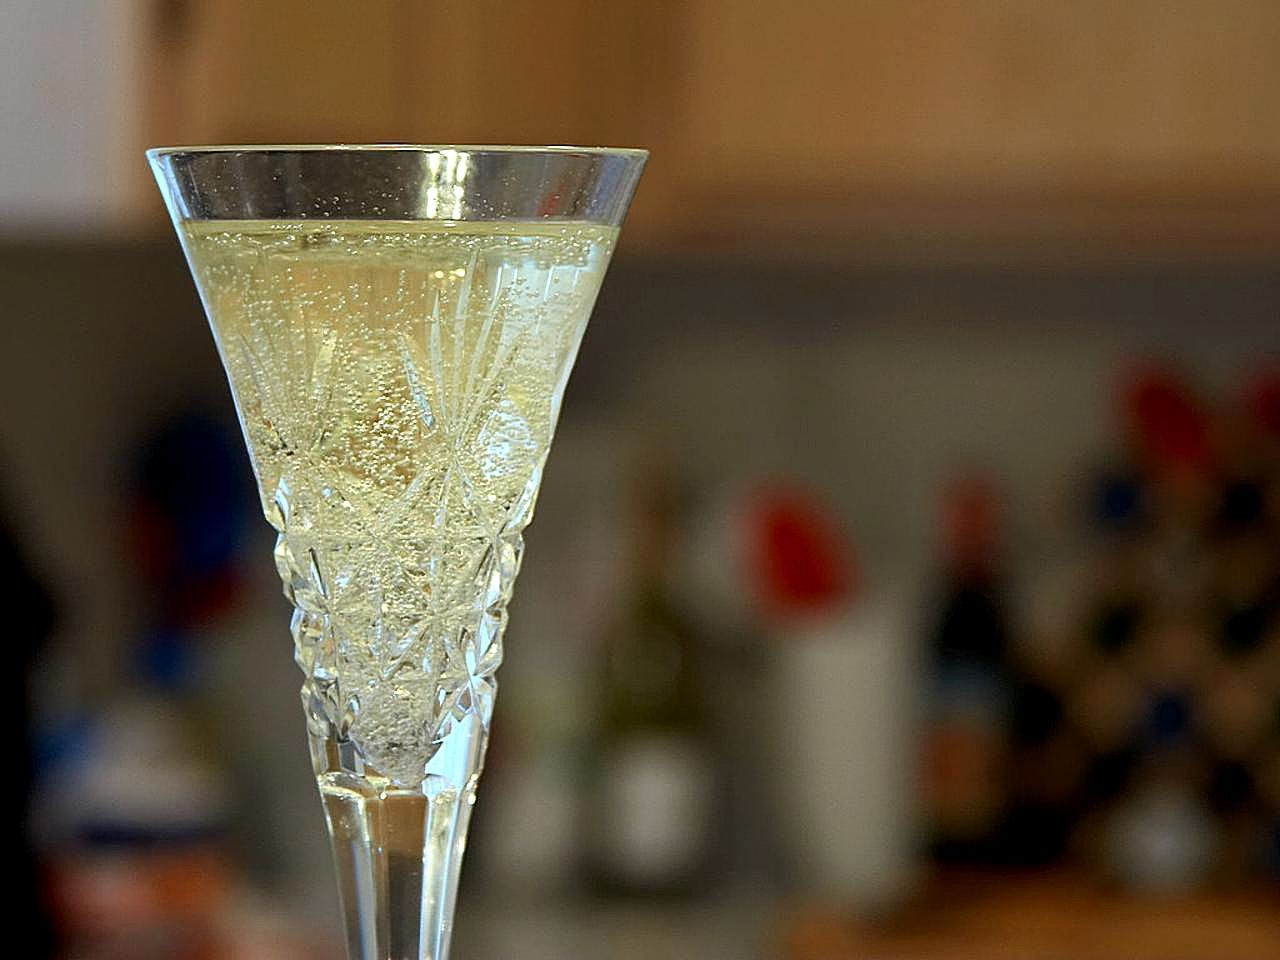 champagne-flutes-glasses-bubbles.jpg